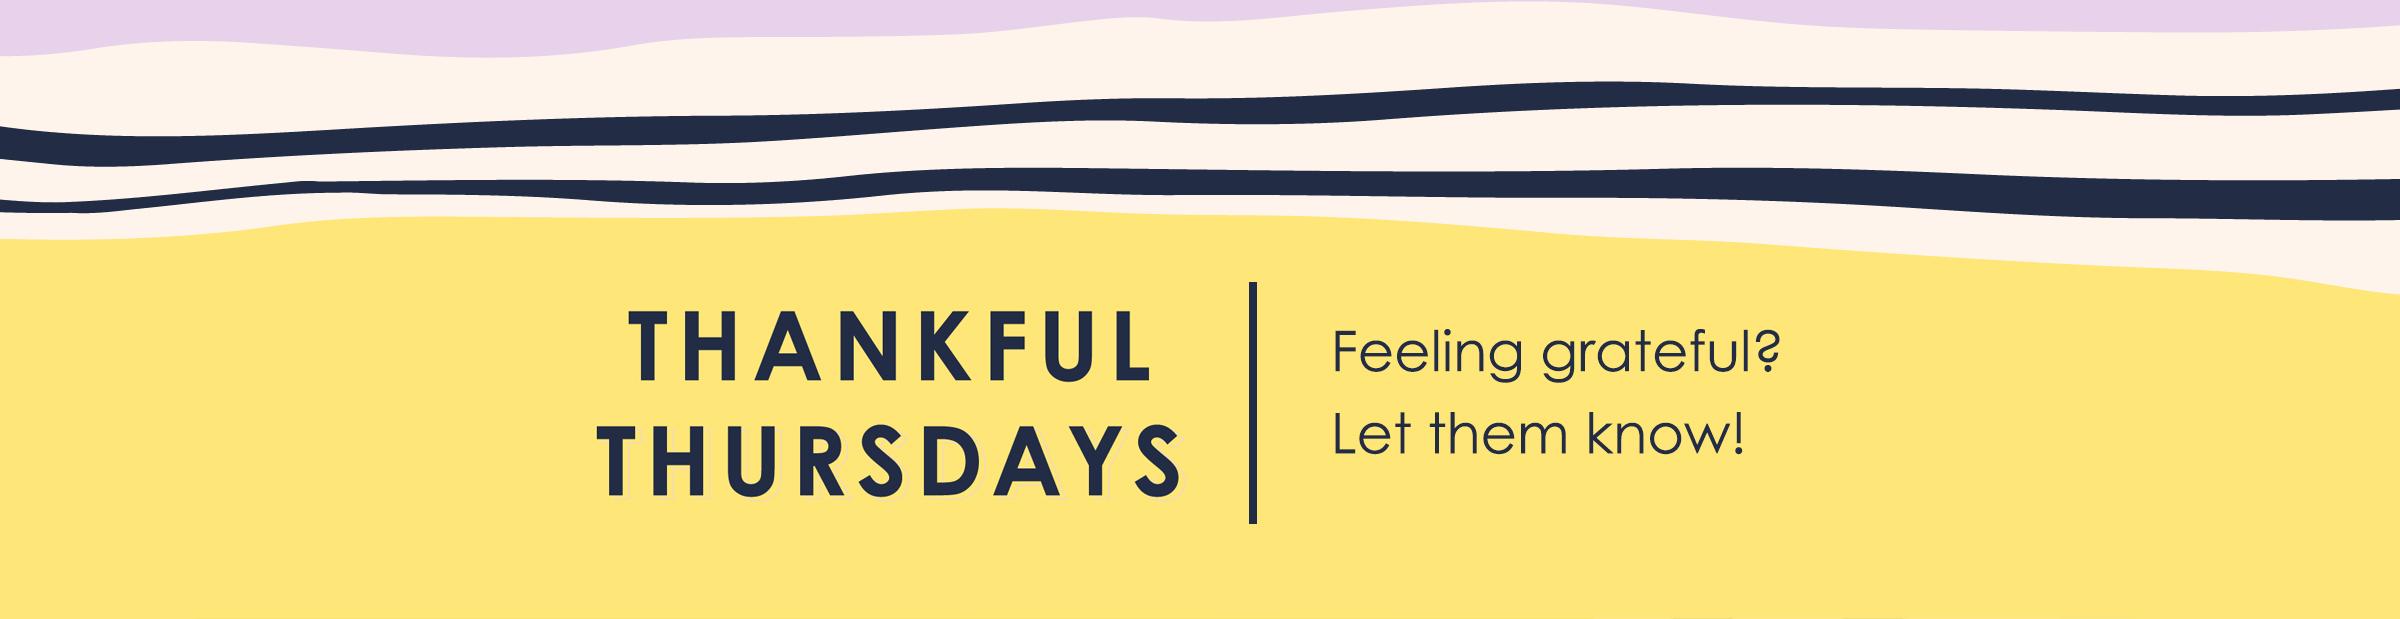 Thankful Thursdays Banner